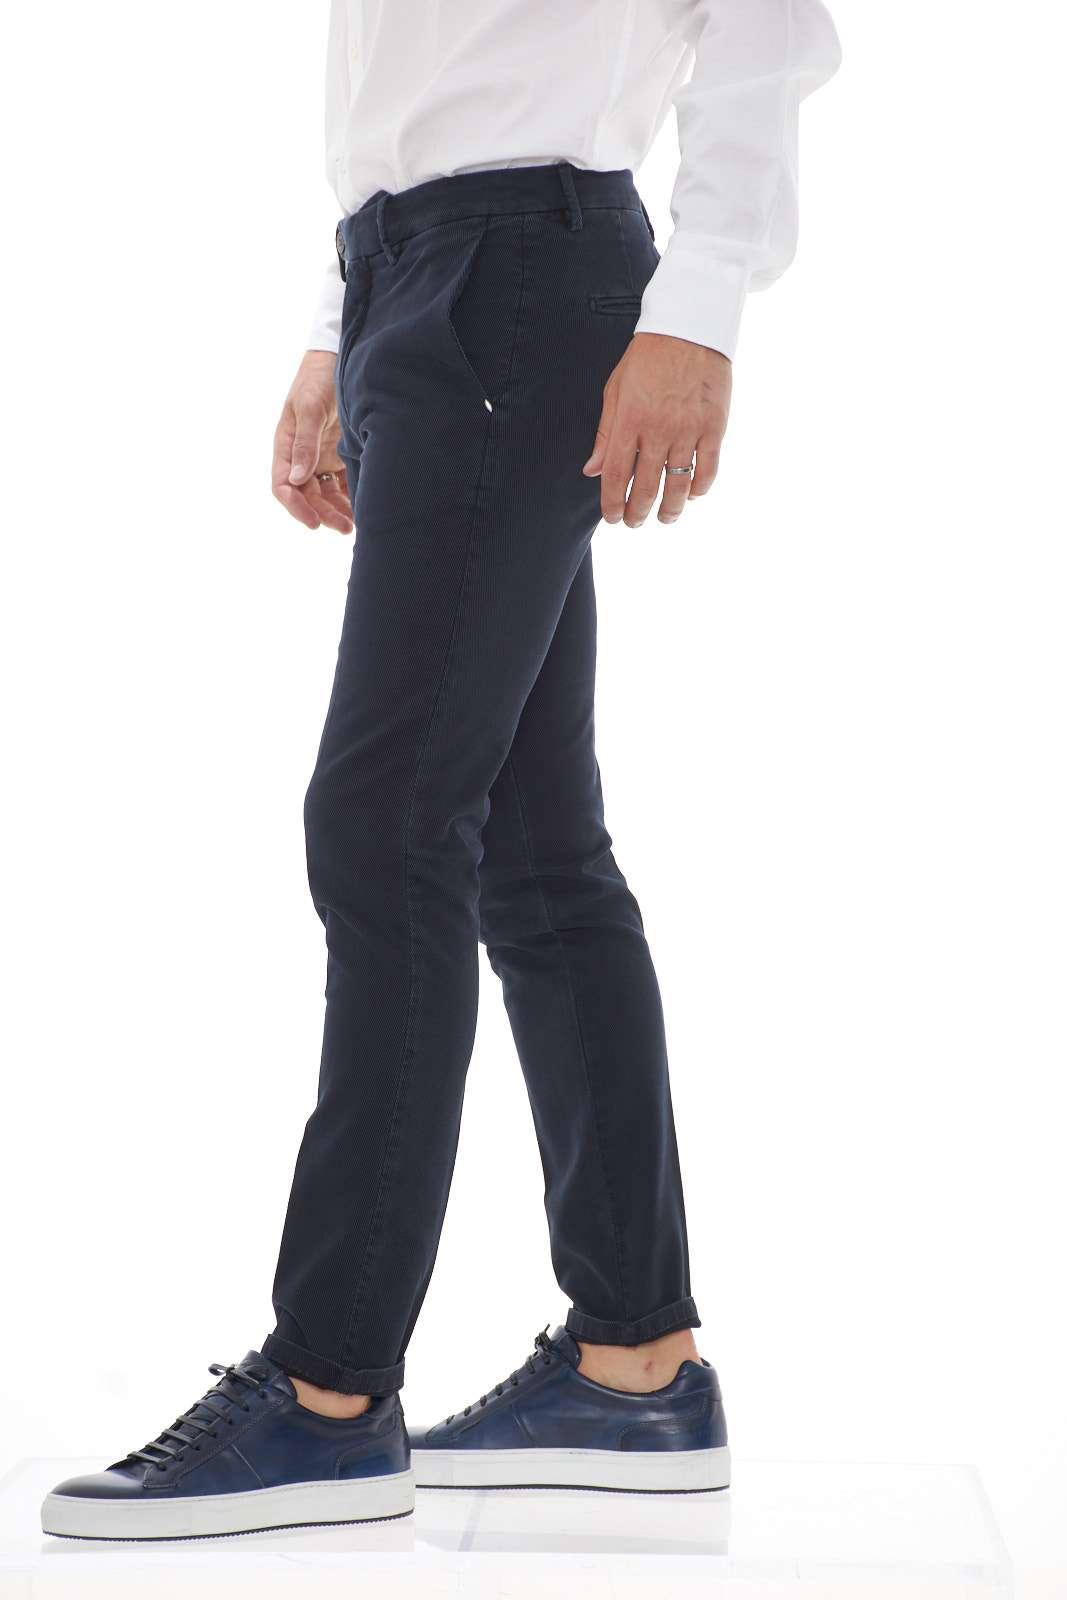 AI-outlet_parmax-pantaloni-uomo-Michael-Coal-ricky2499